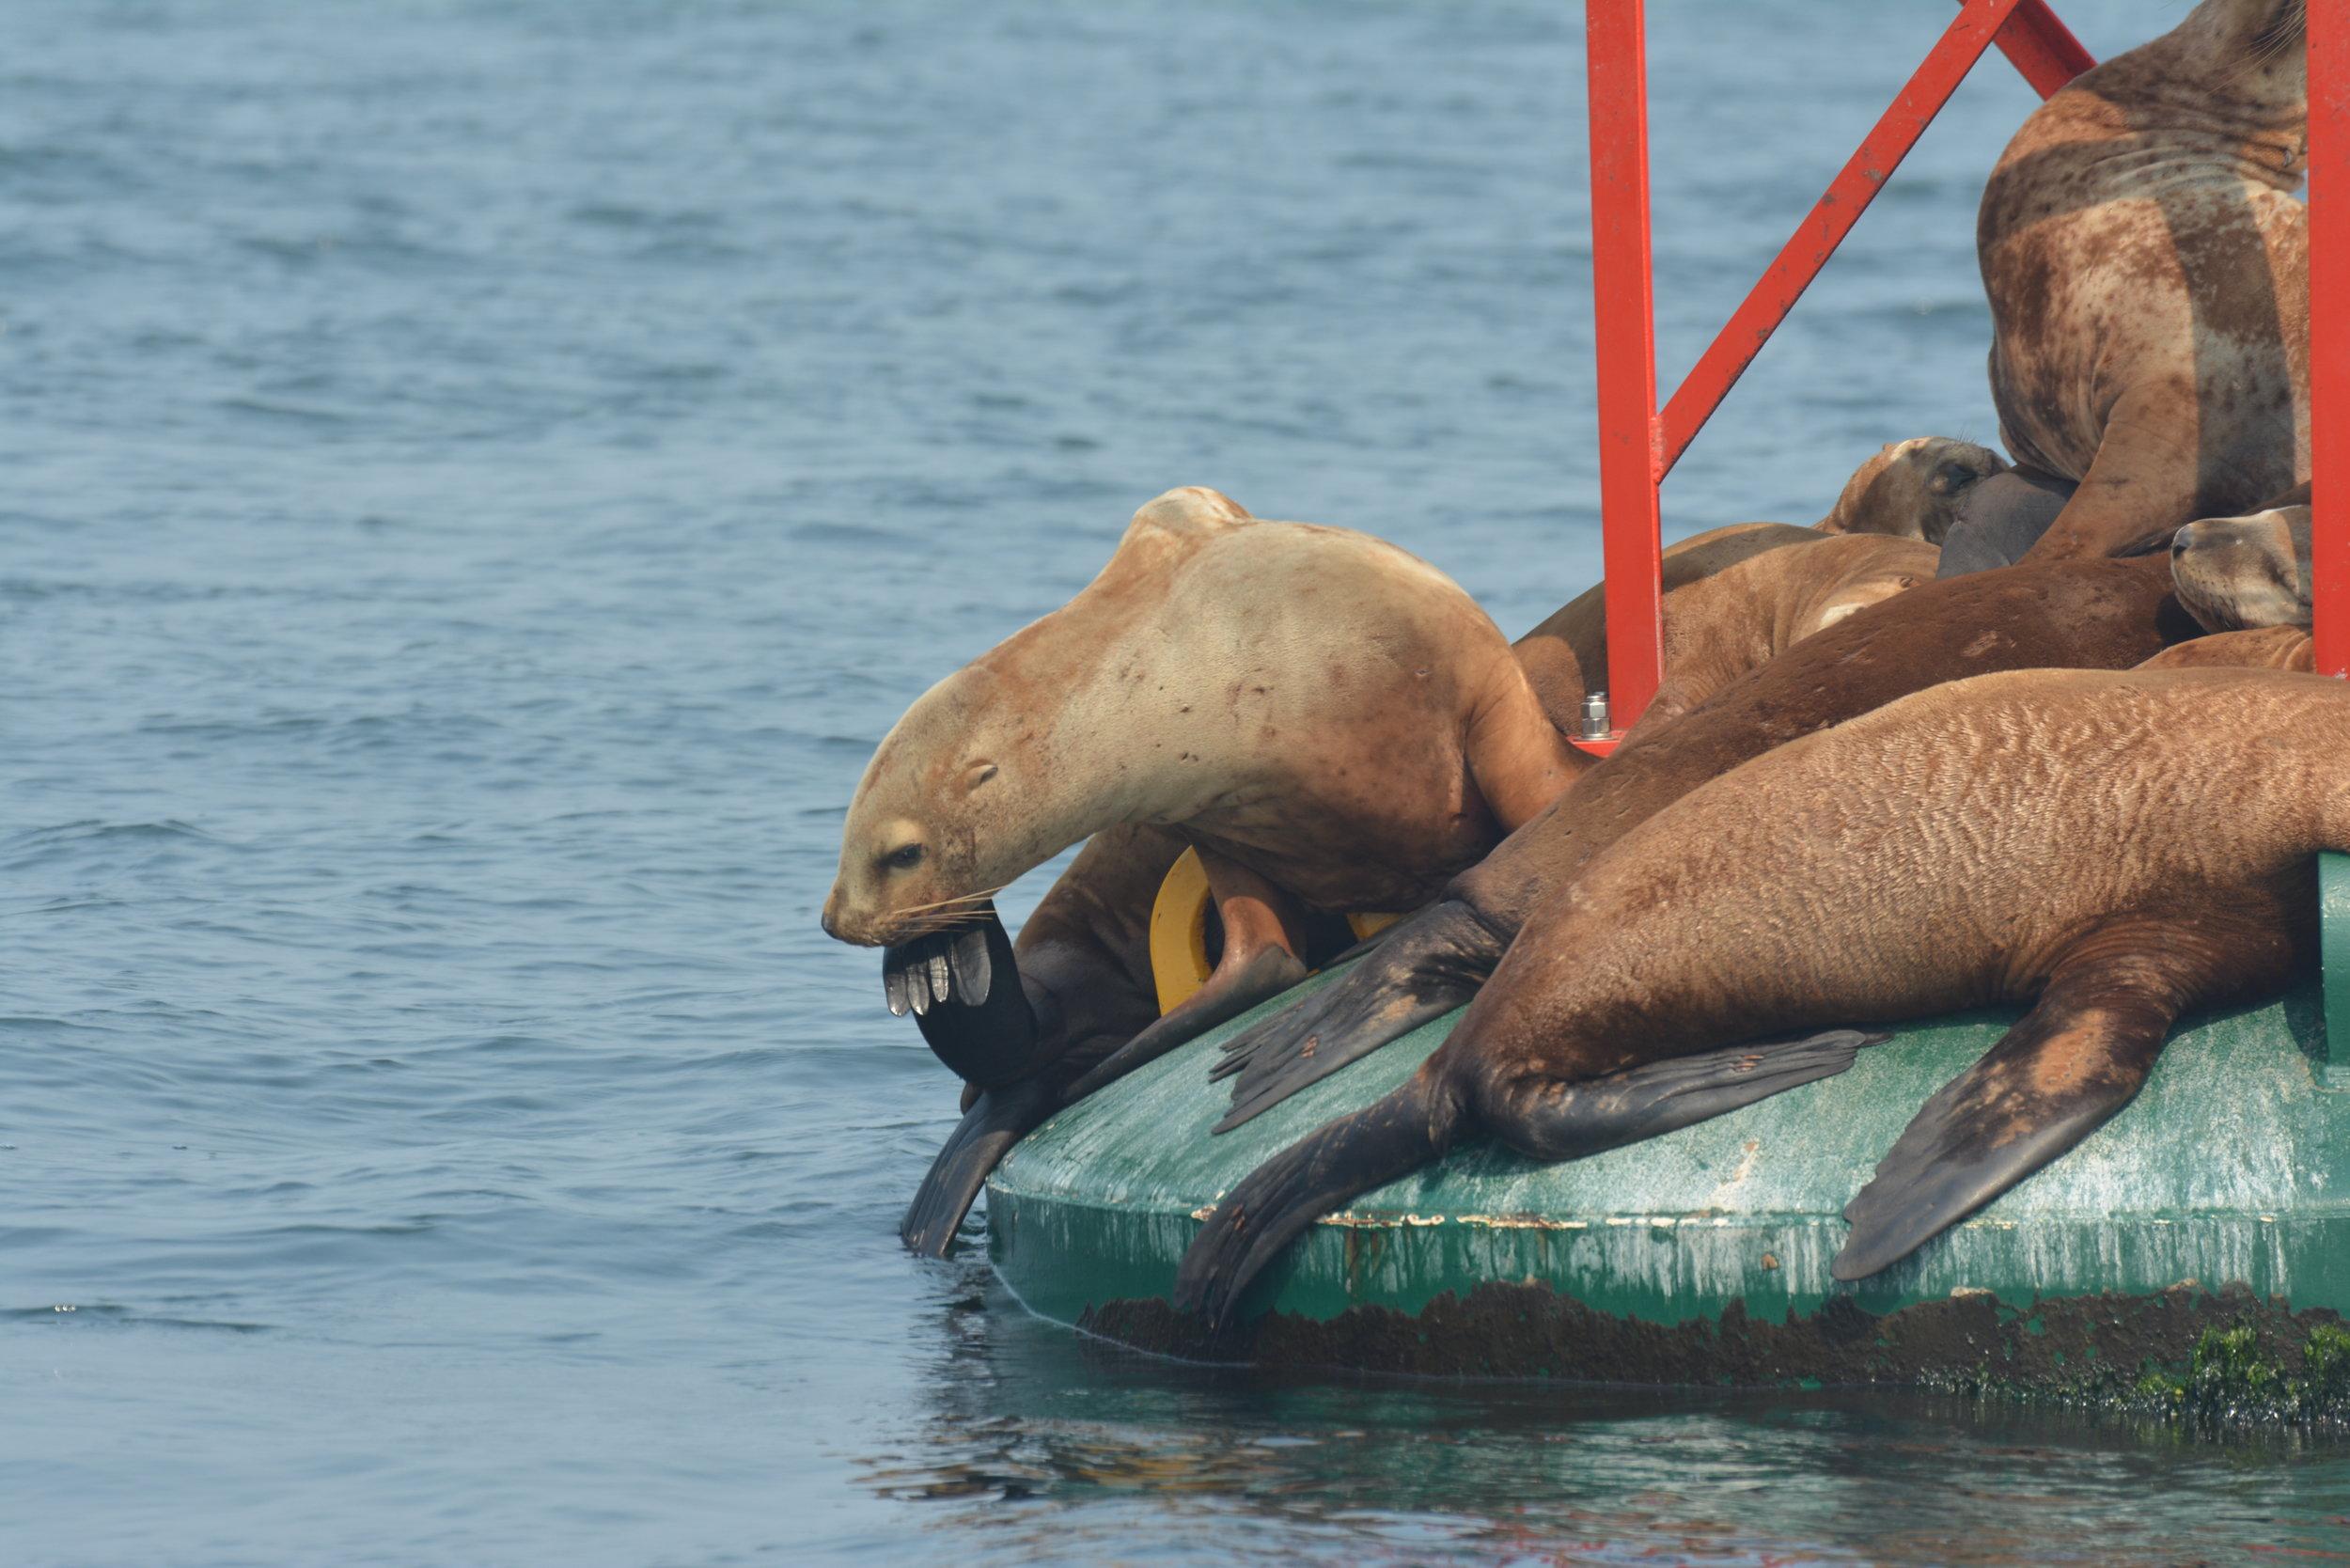 Itchy sea lion! Photo by Alanna Vivani.